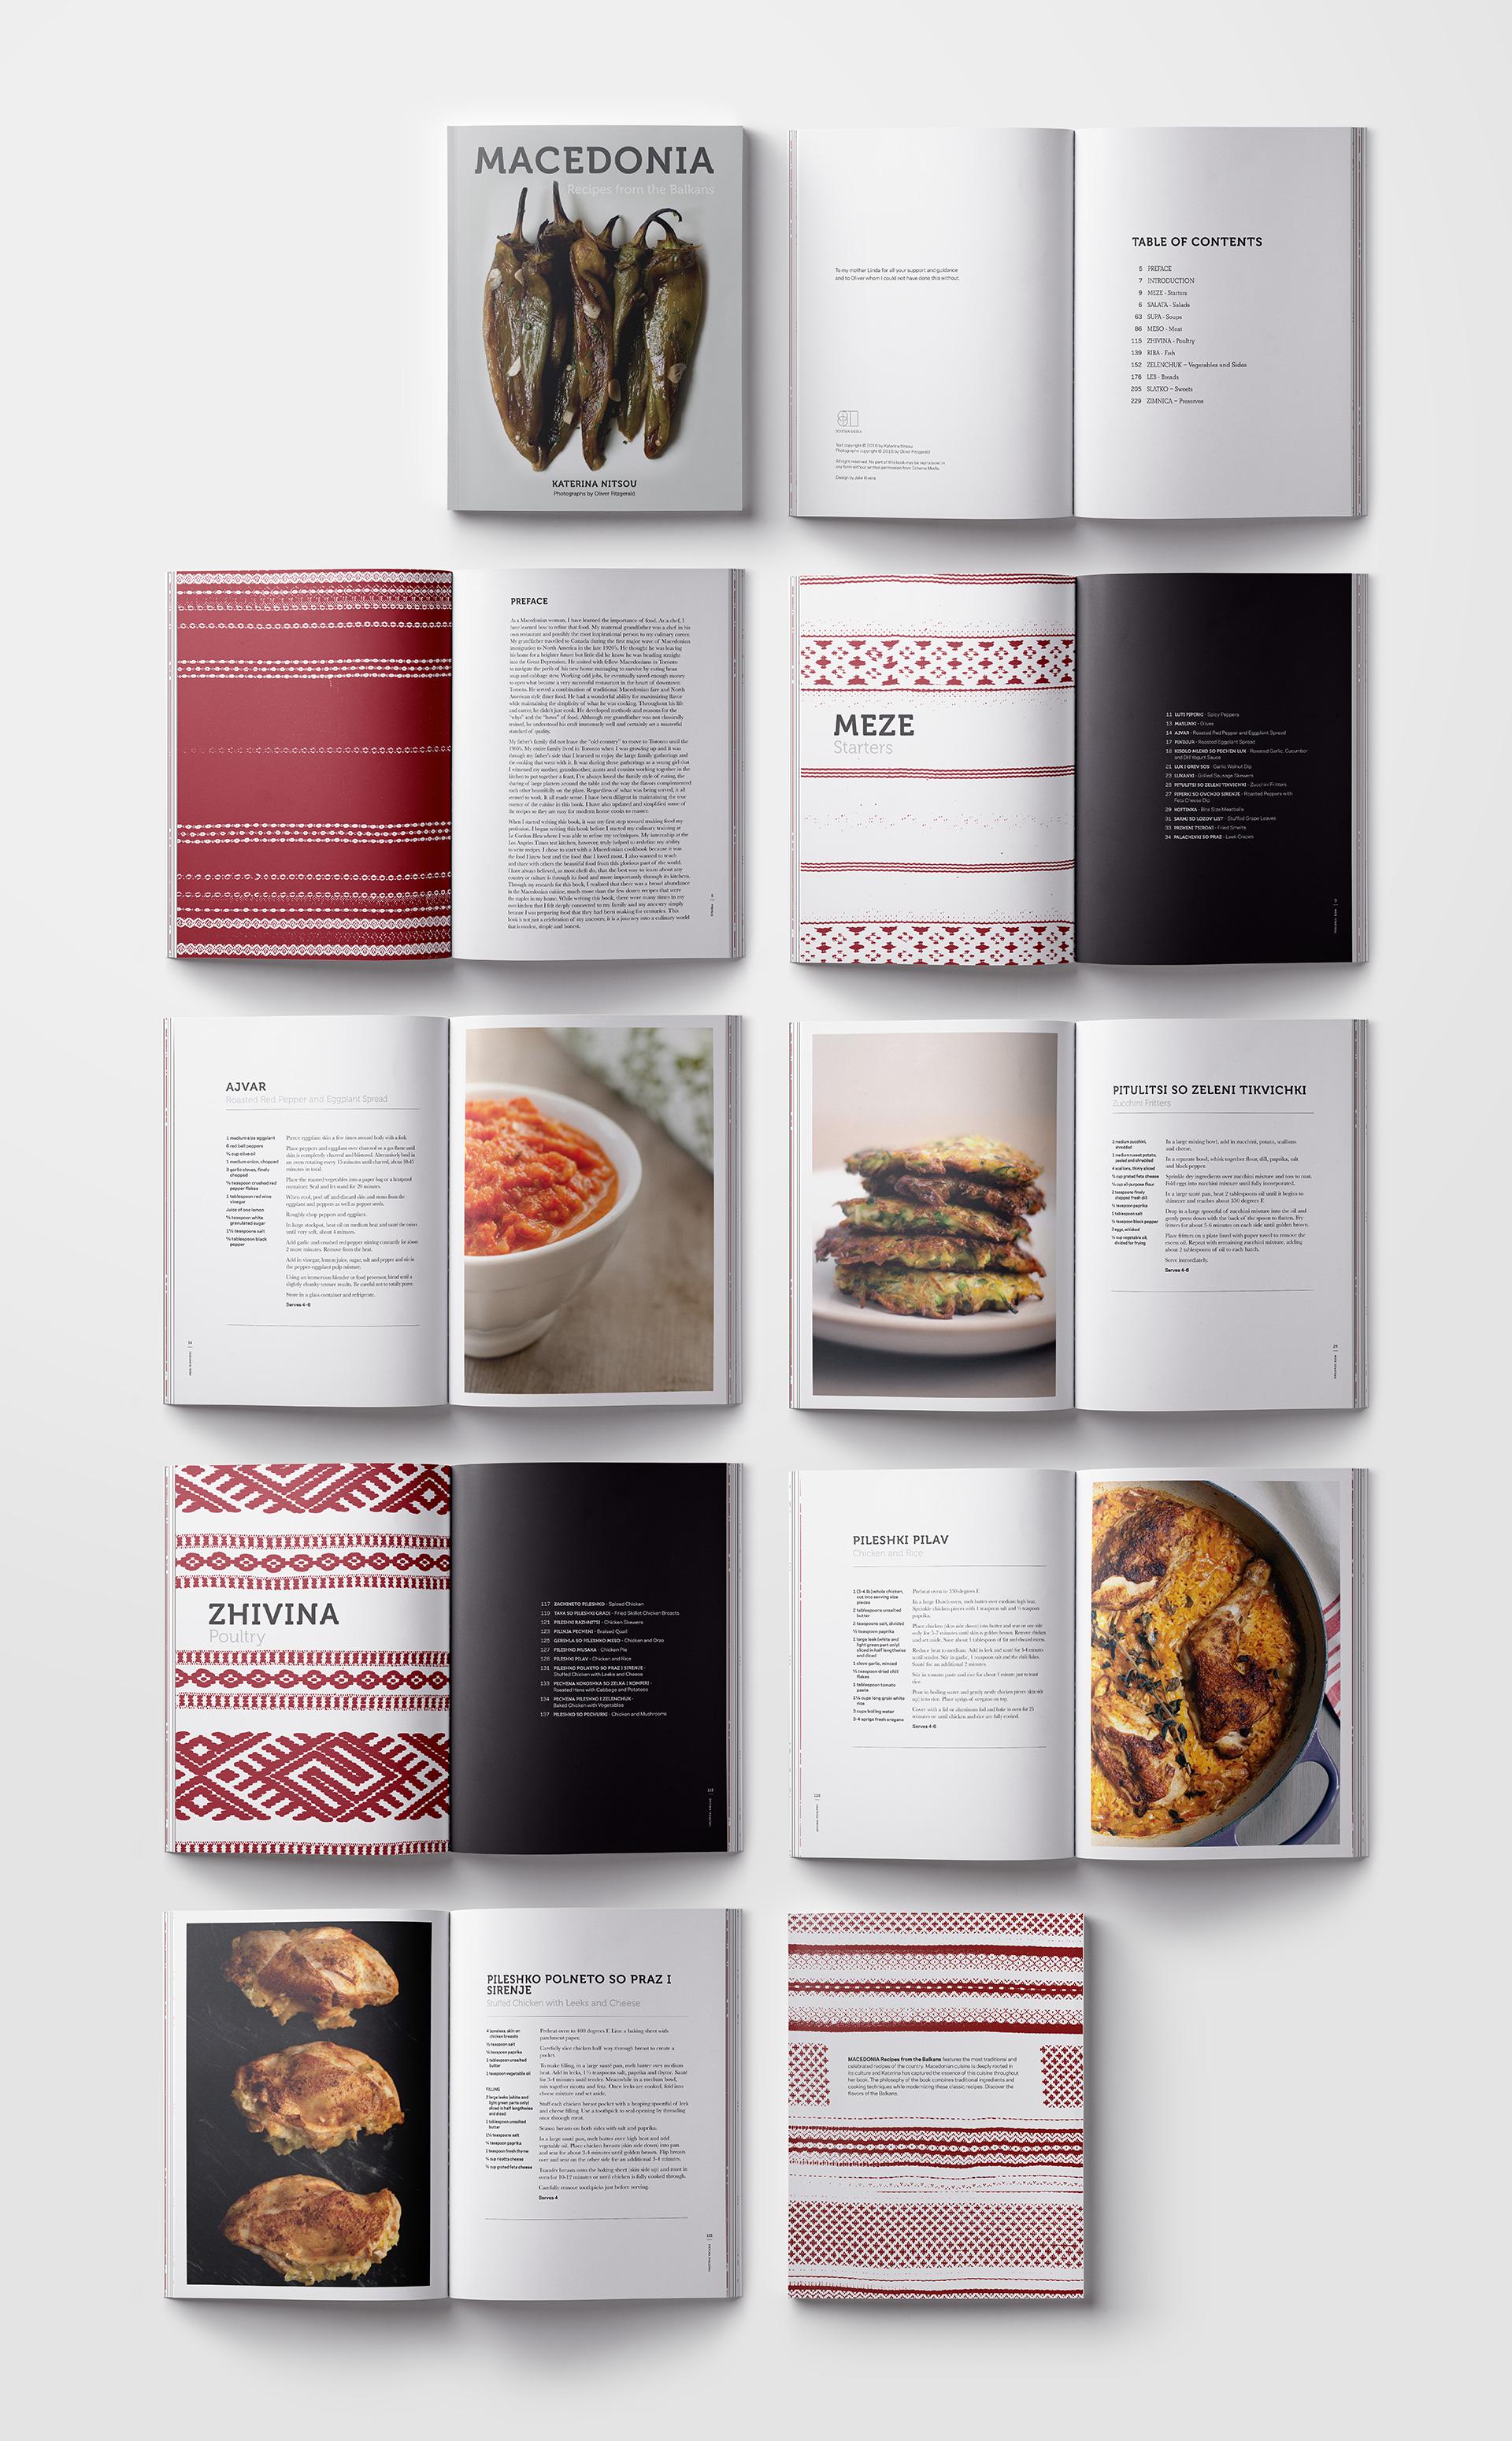 Macedonia_Cookbook_Group_v2